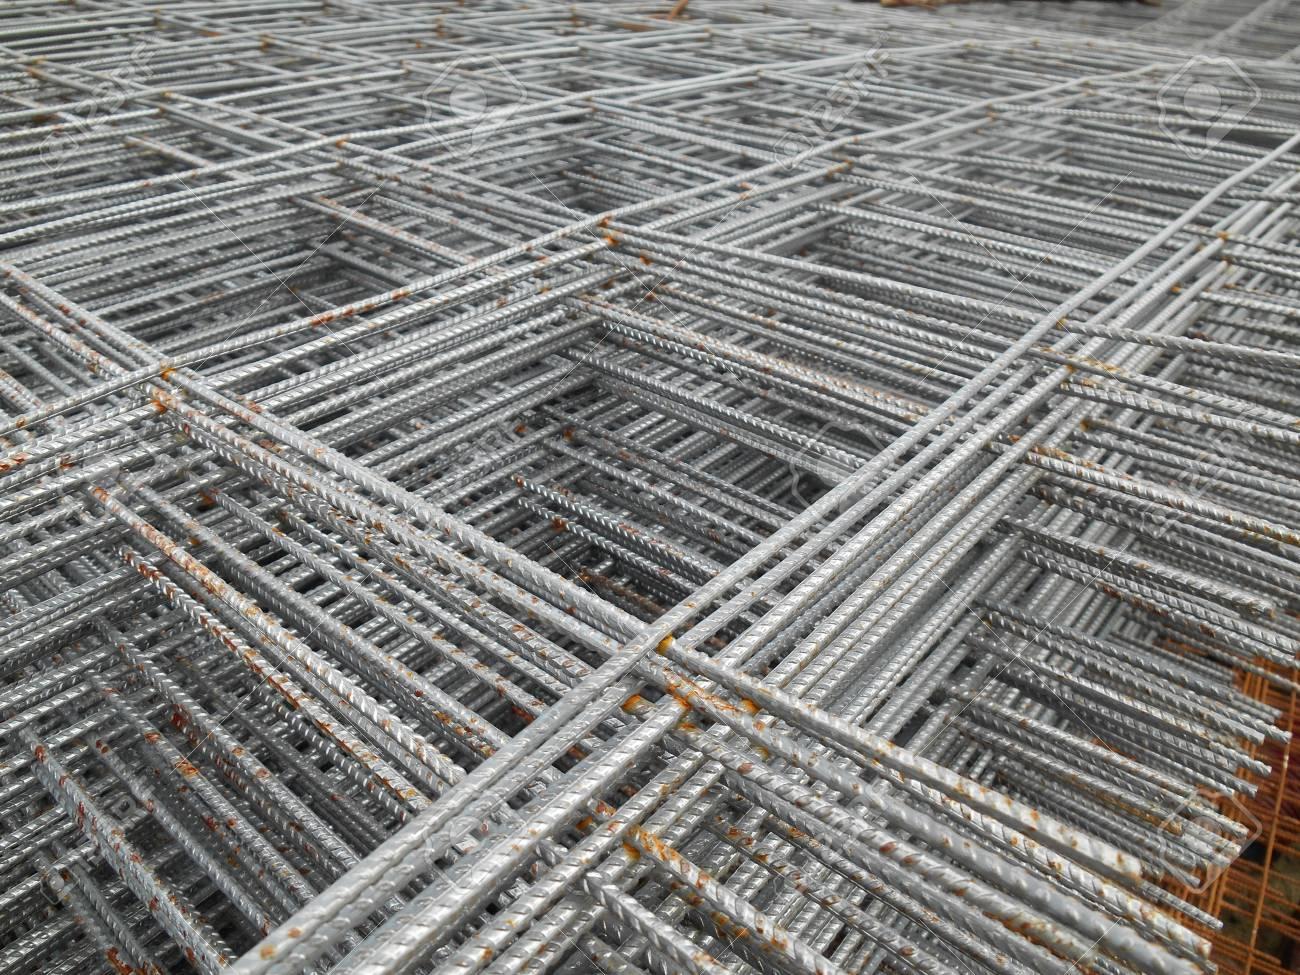 KUALA LUMPUR, MALAYSIA -JANUARY 31, 2017: Welded Wire mesh, or